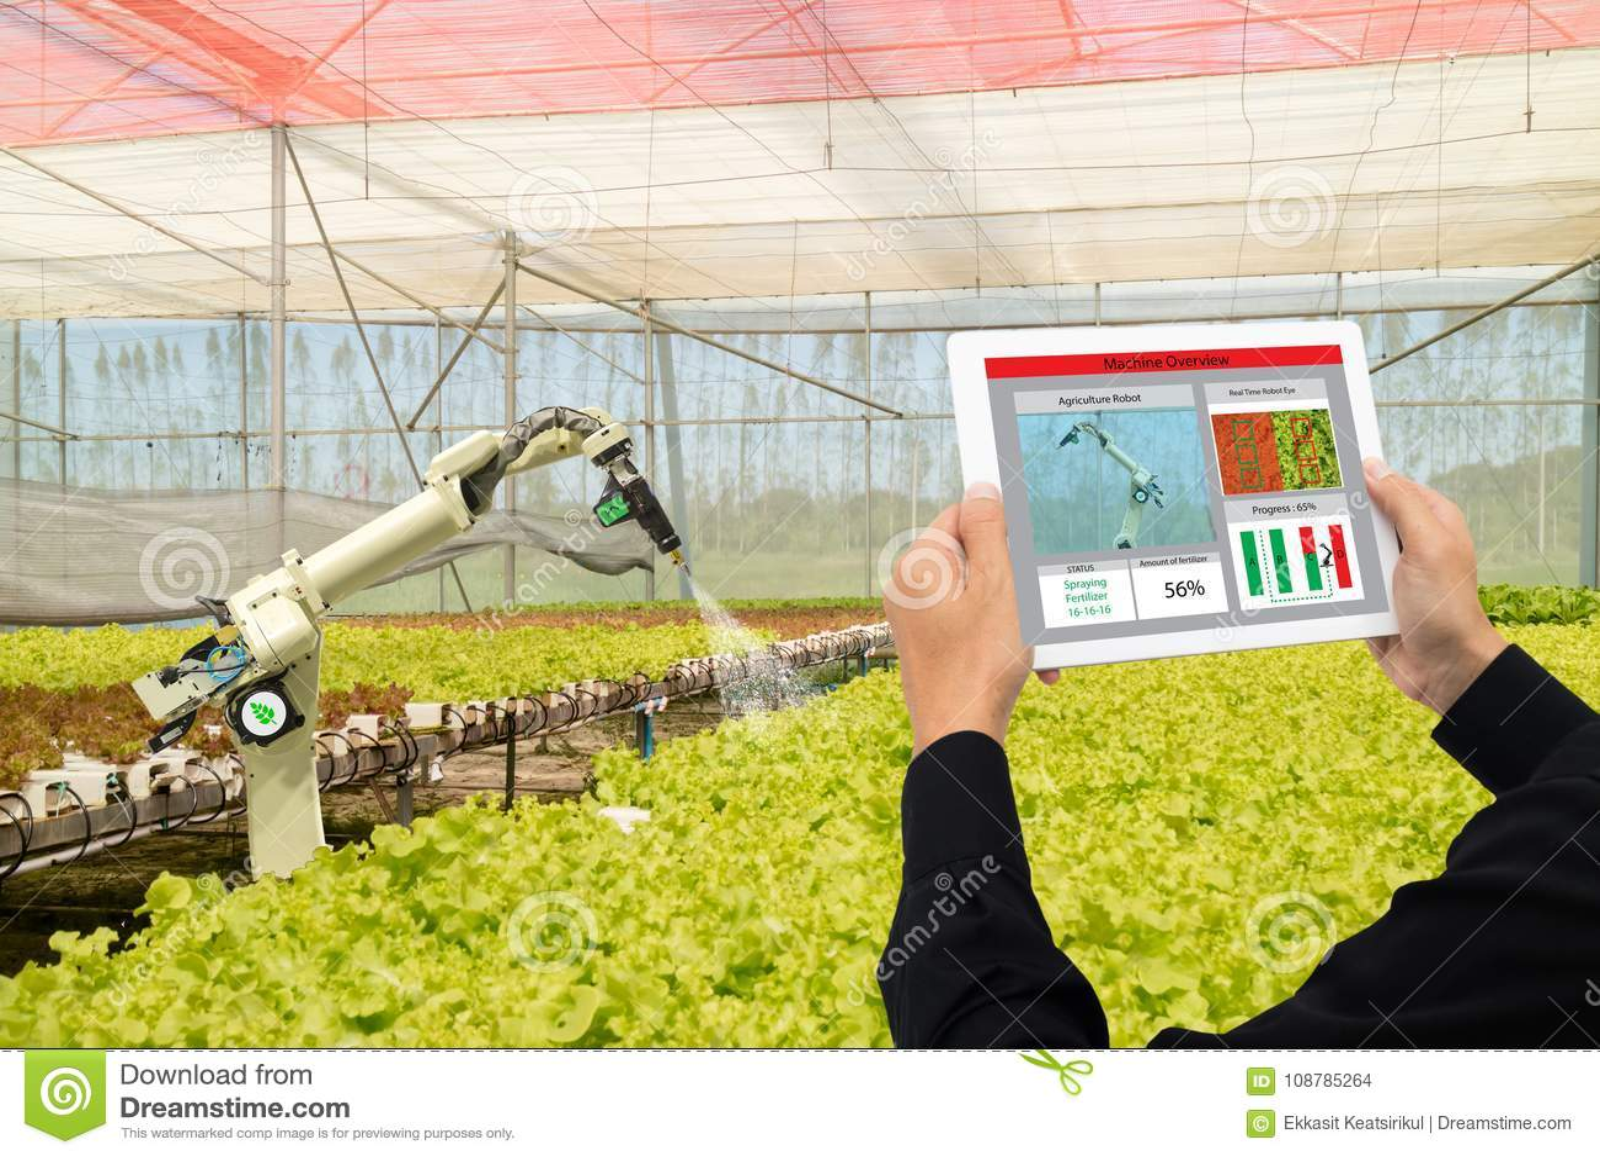 Robô esperto 4 da indústria de Iot 0 conceitos da agricultura, agrônomo industrial, fazendeiro que usa a tecnologia de inteligênc